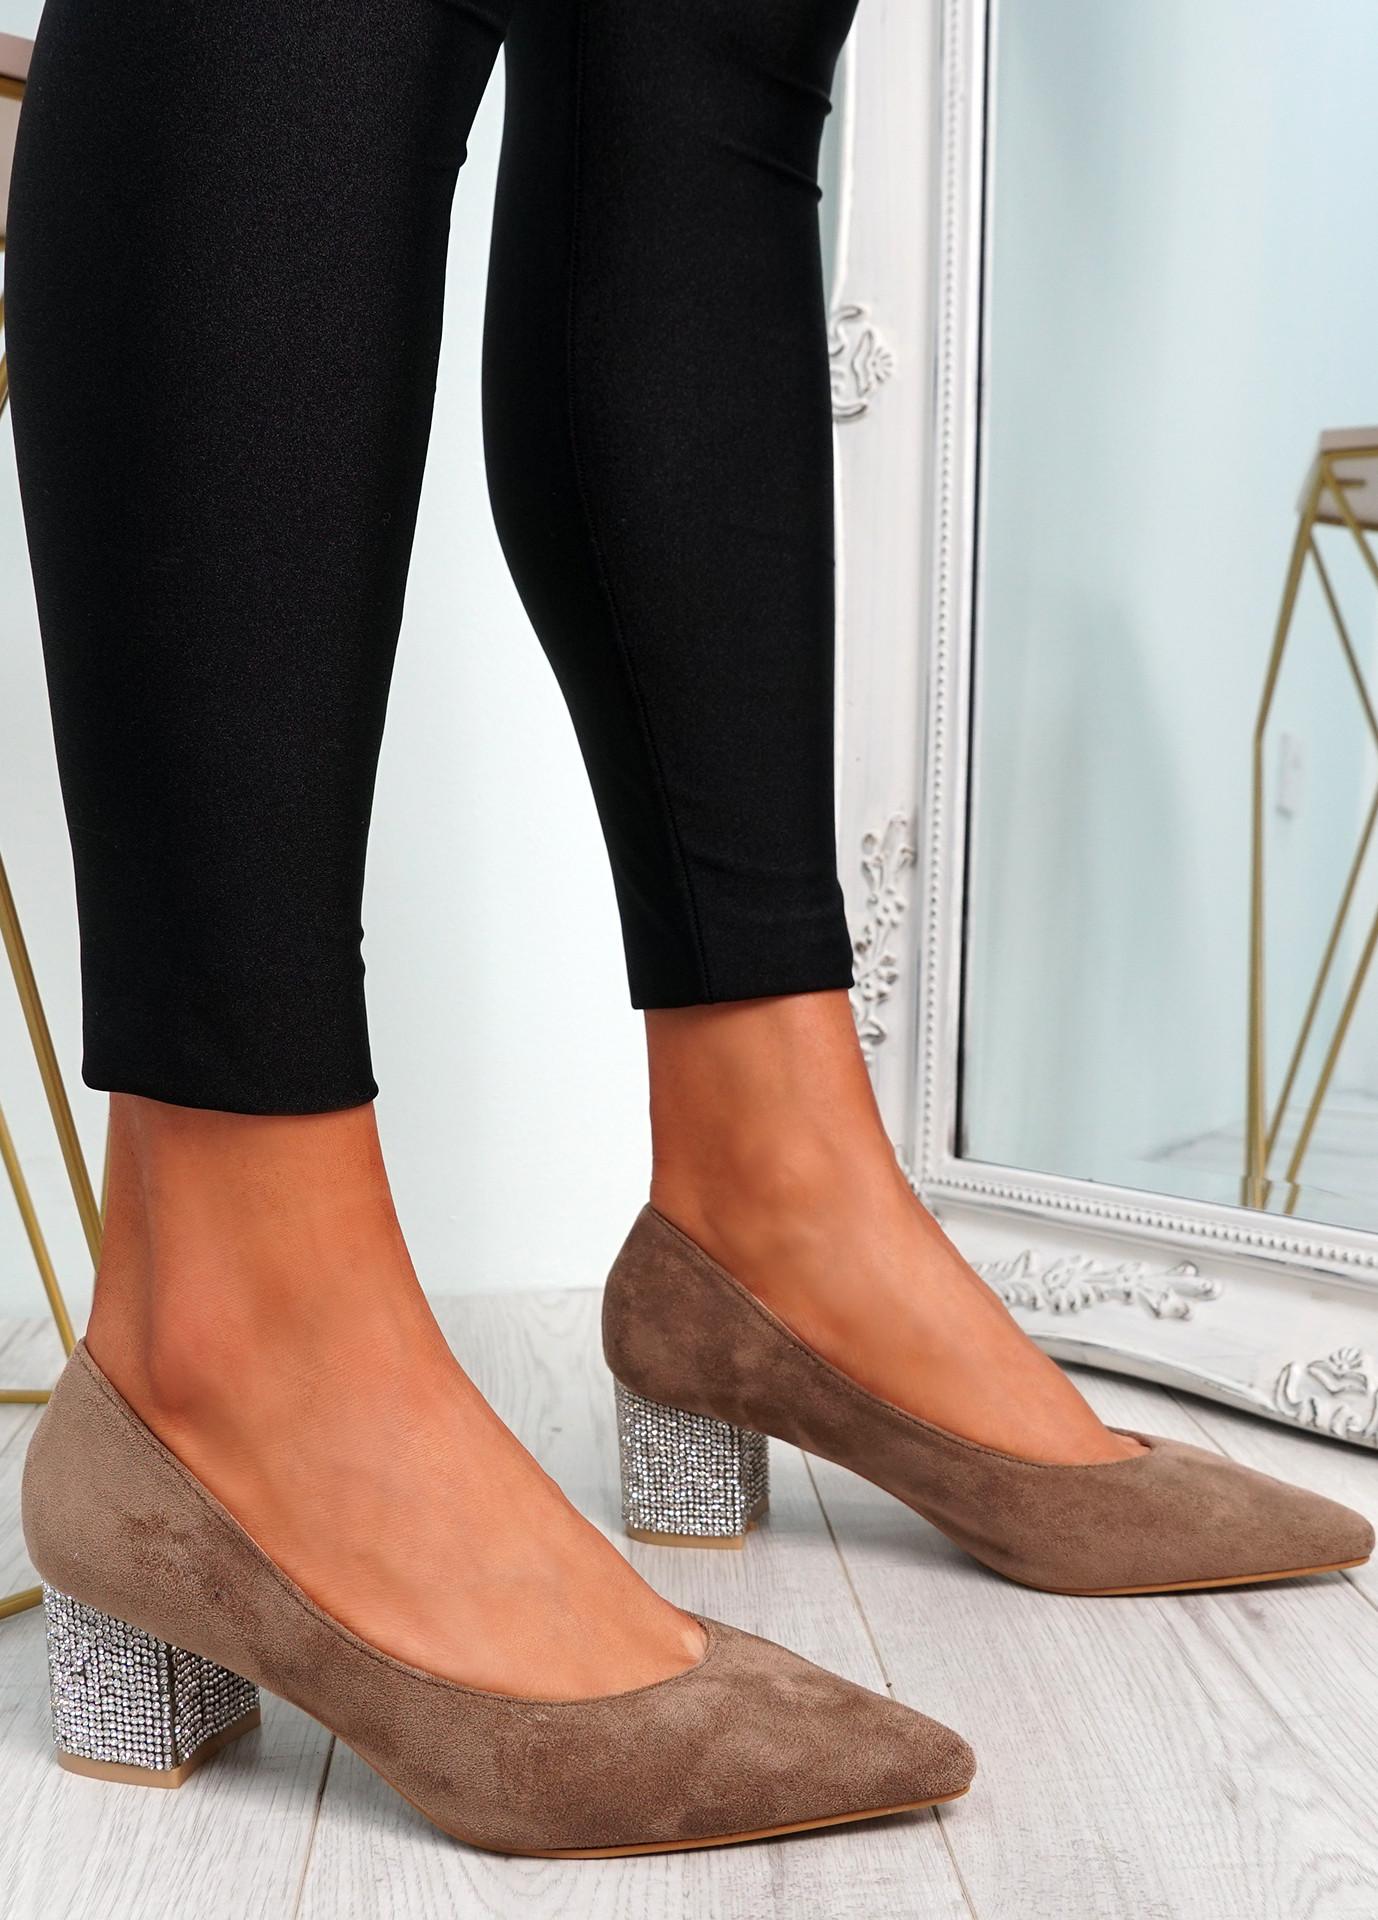 Chami Khaki Studded Block Heel Pumps